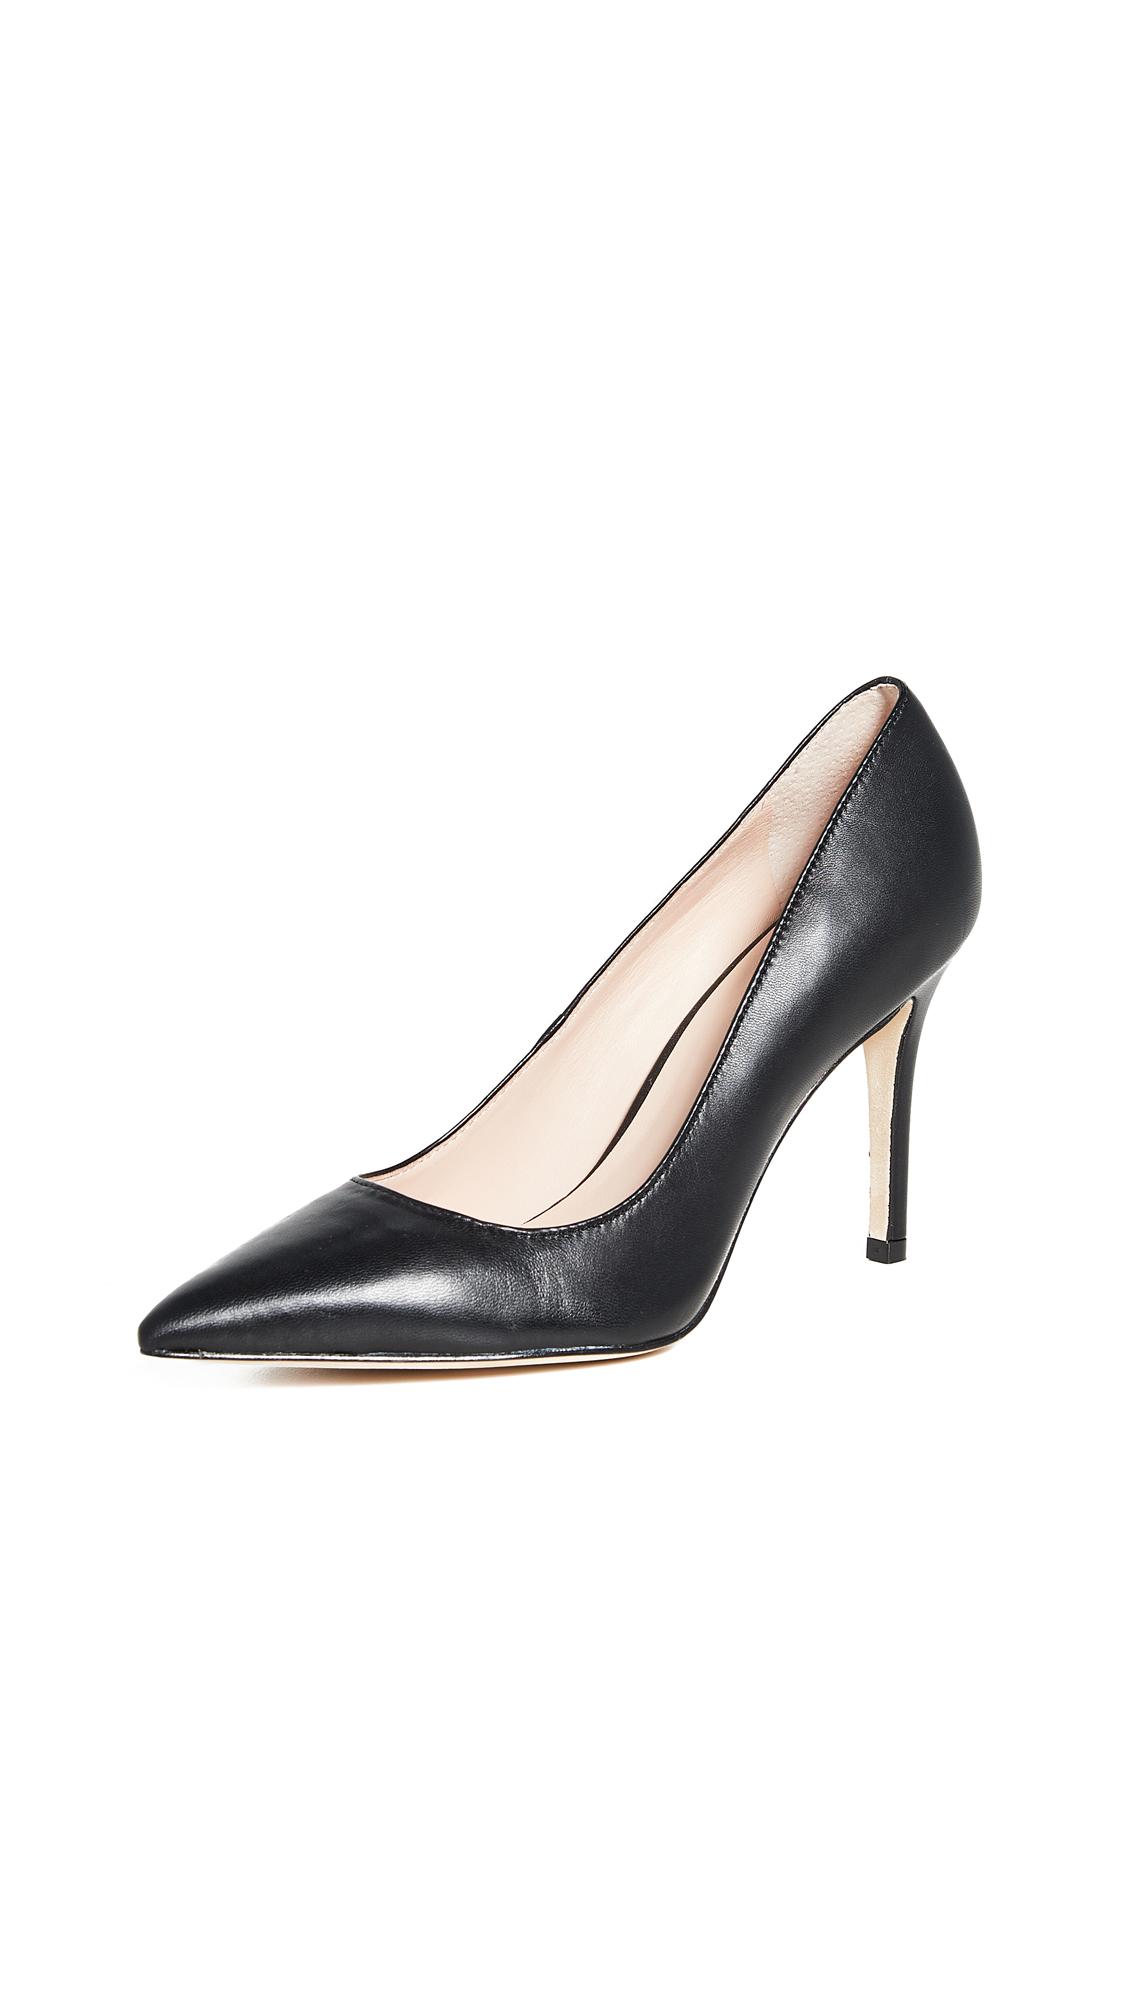 Kate Spade Vivian Point Toe Pumps In Black